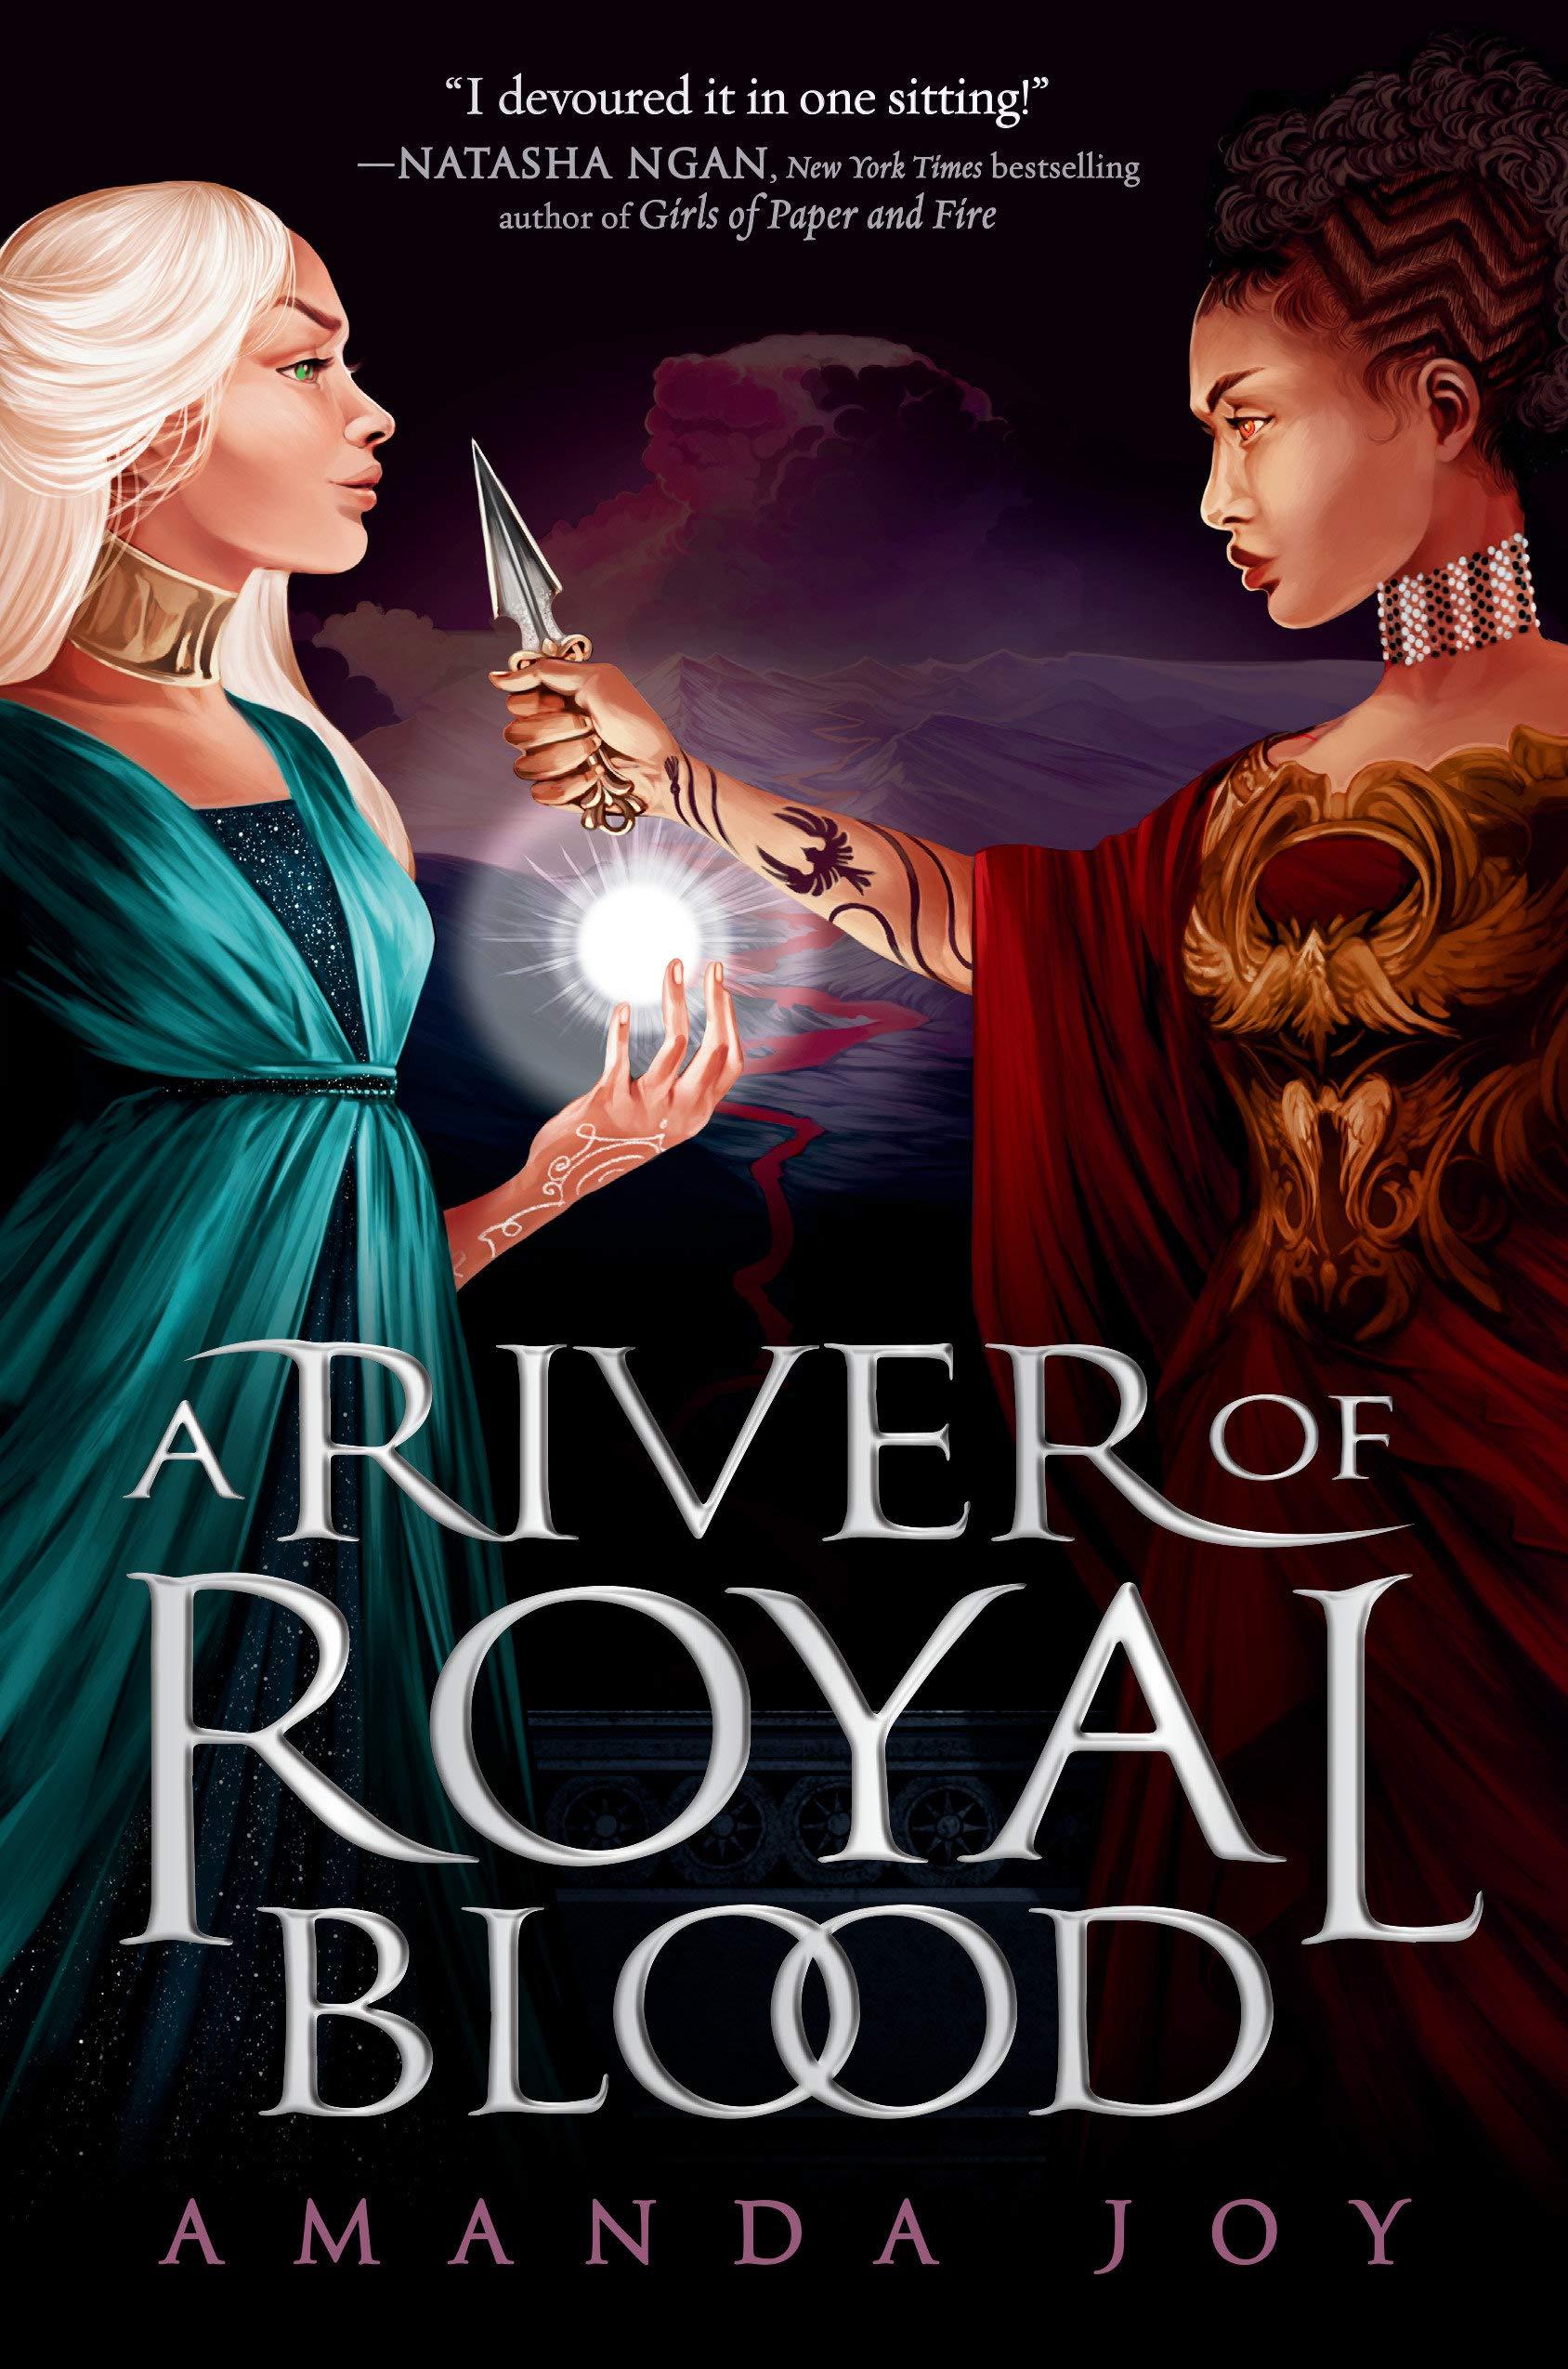 Amazon.com: A River of Royal Blood (9780525518587): Joy, Amanda: Books